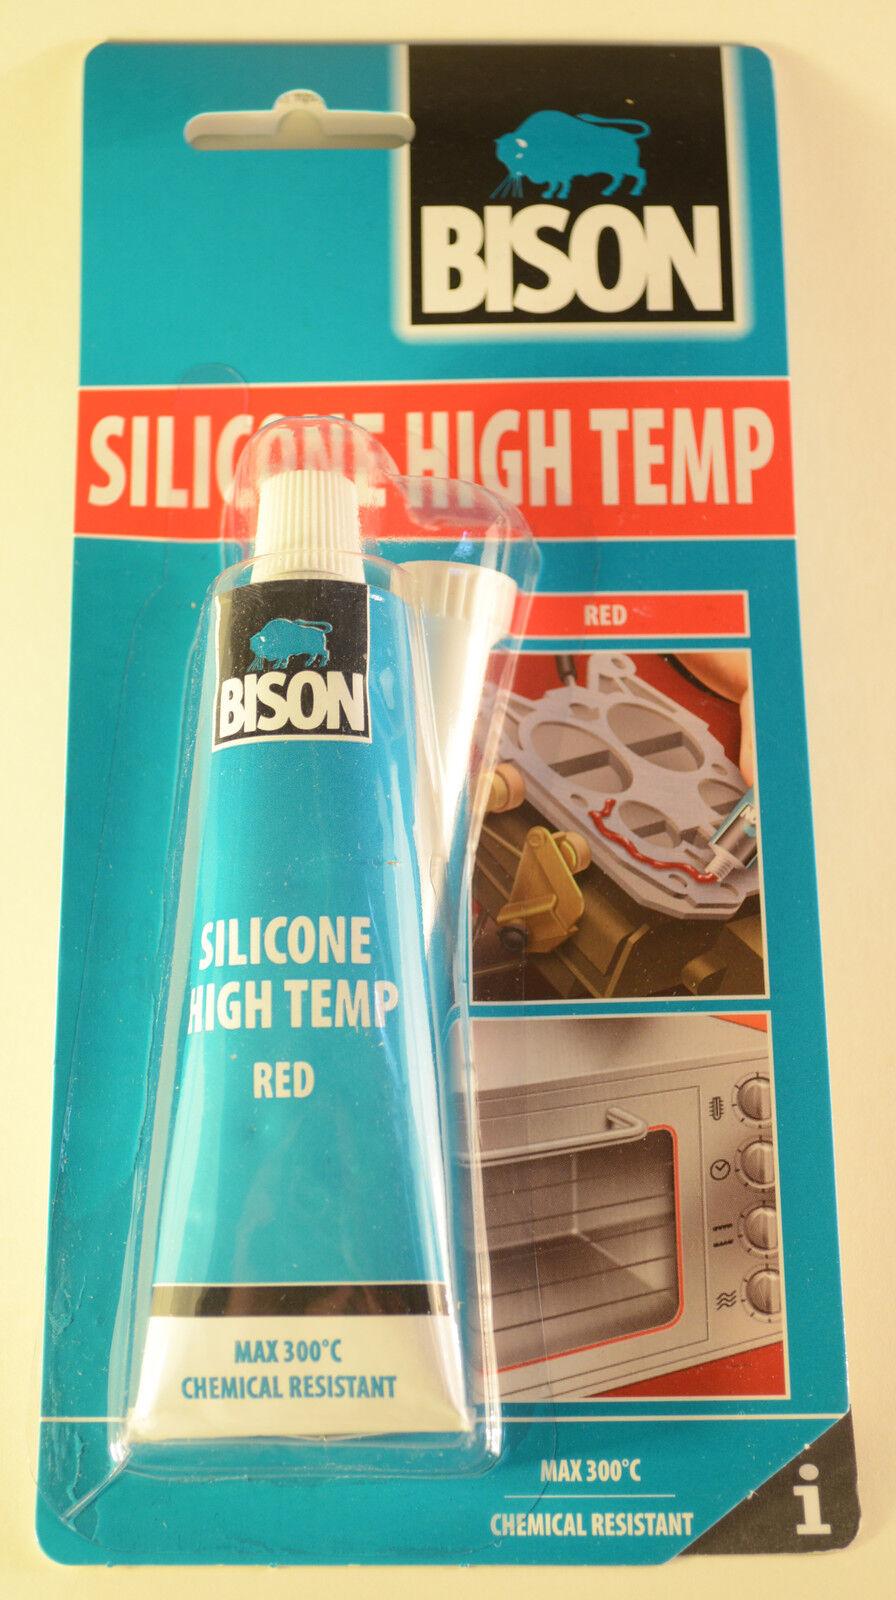 High Temperature Oven Door Glass Adhesive Sealant Glue